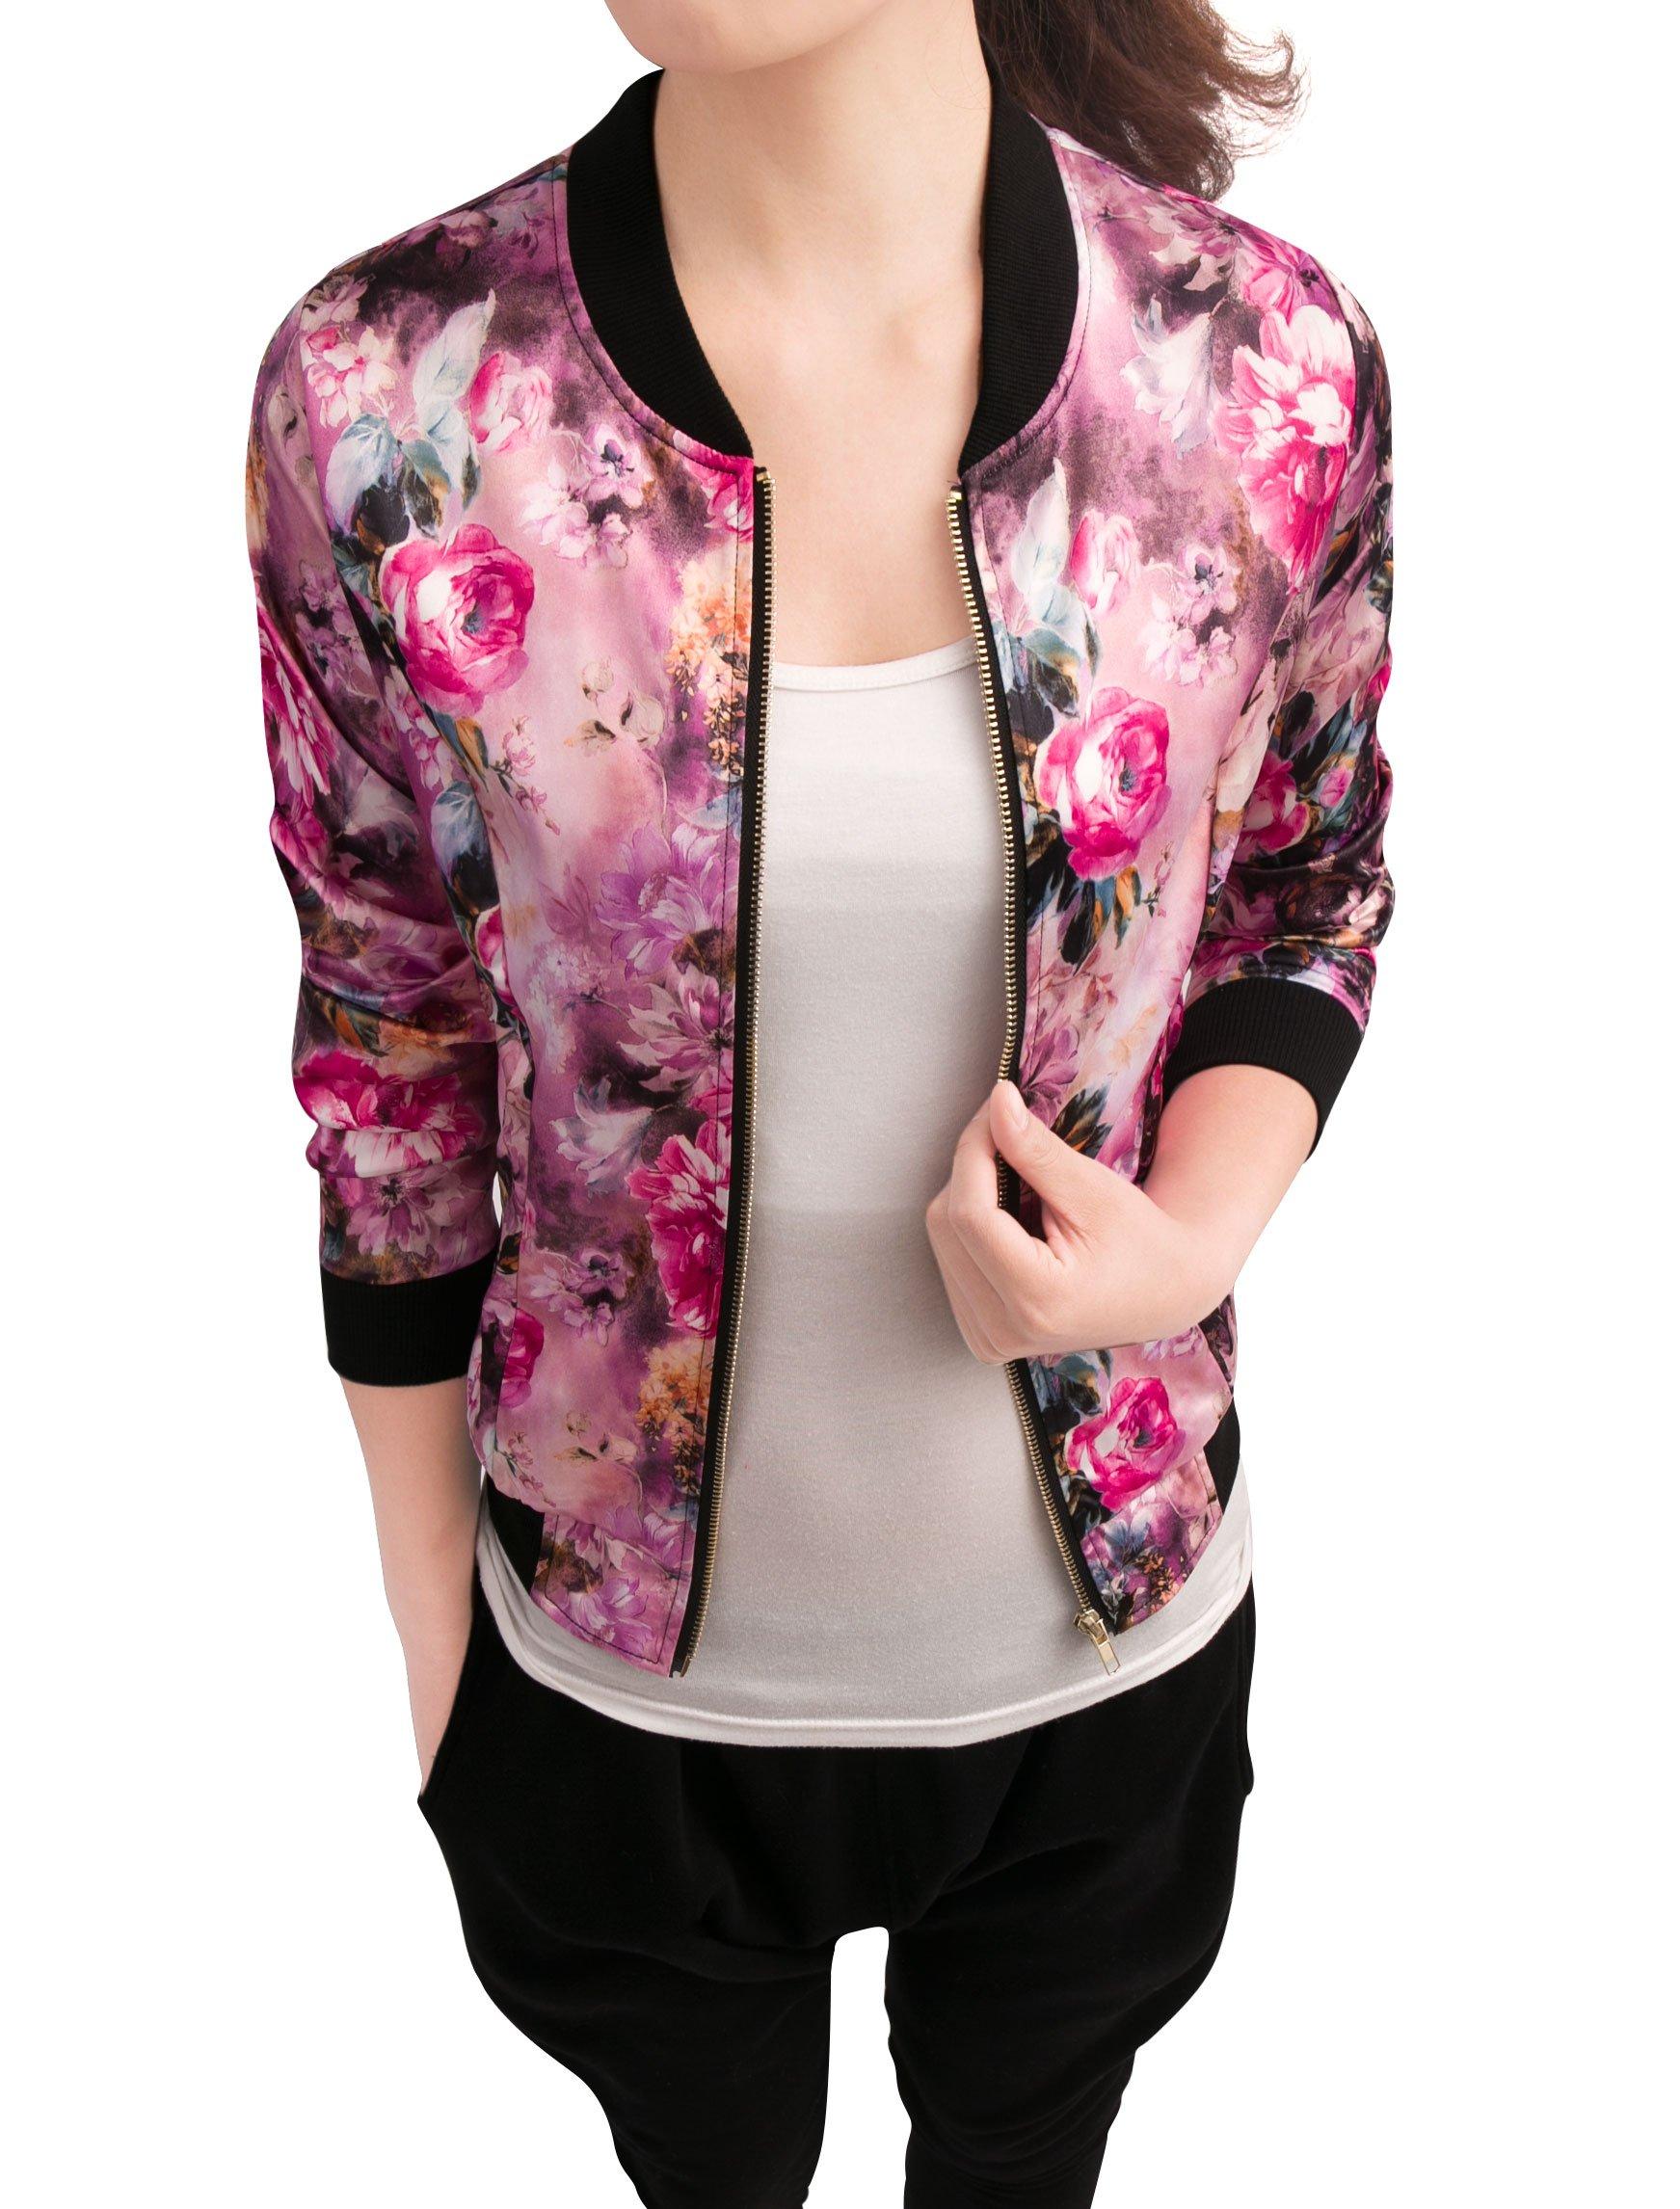 Allegra K Women's Long Sleeve Zip up Floral Print Casual Bomber Jacket Fuchsia S by Allegra K (Image #1)